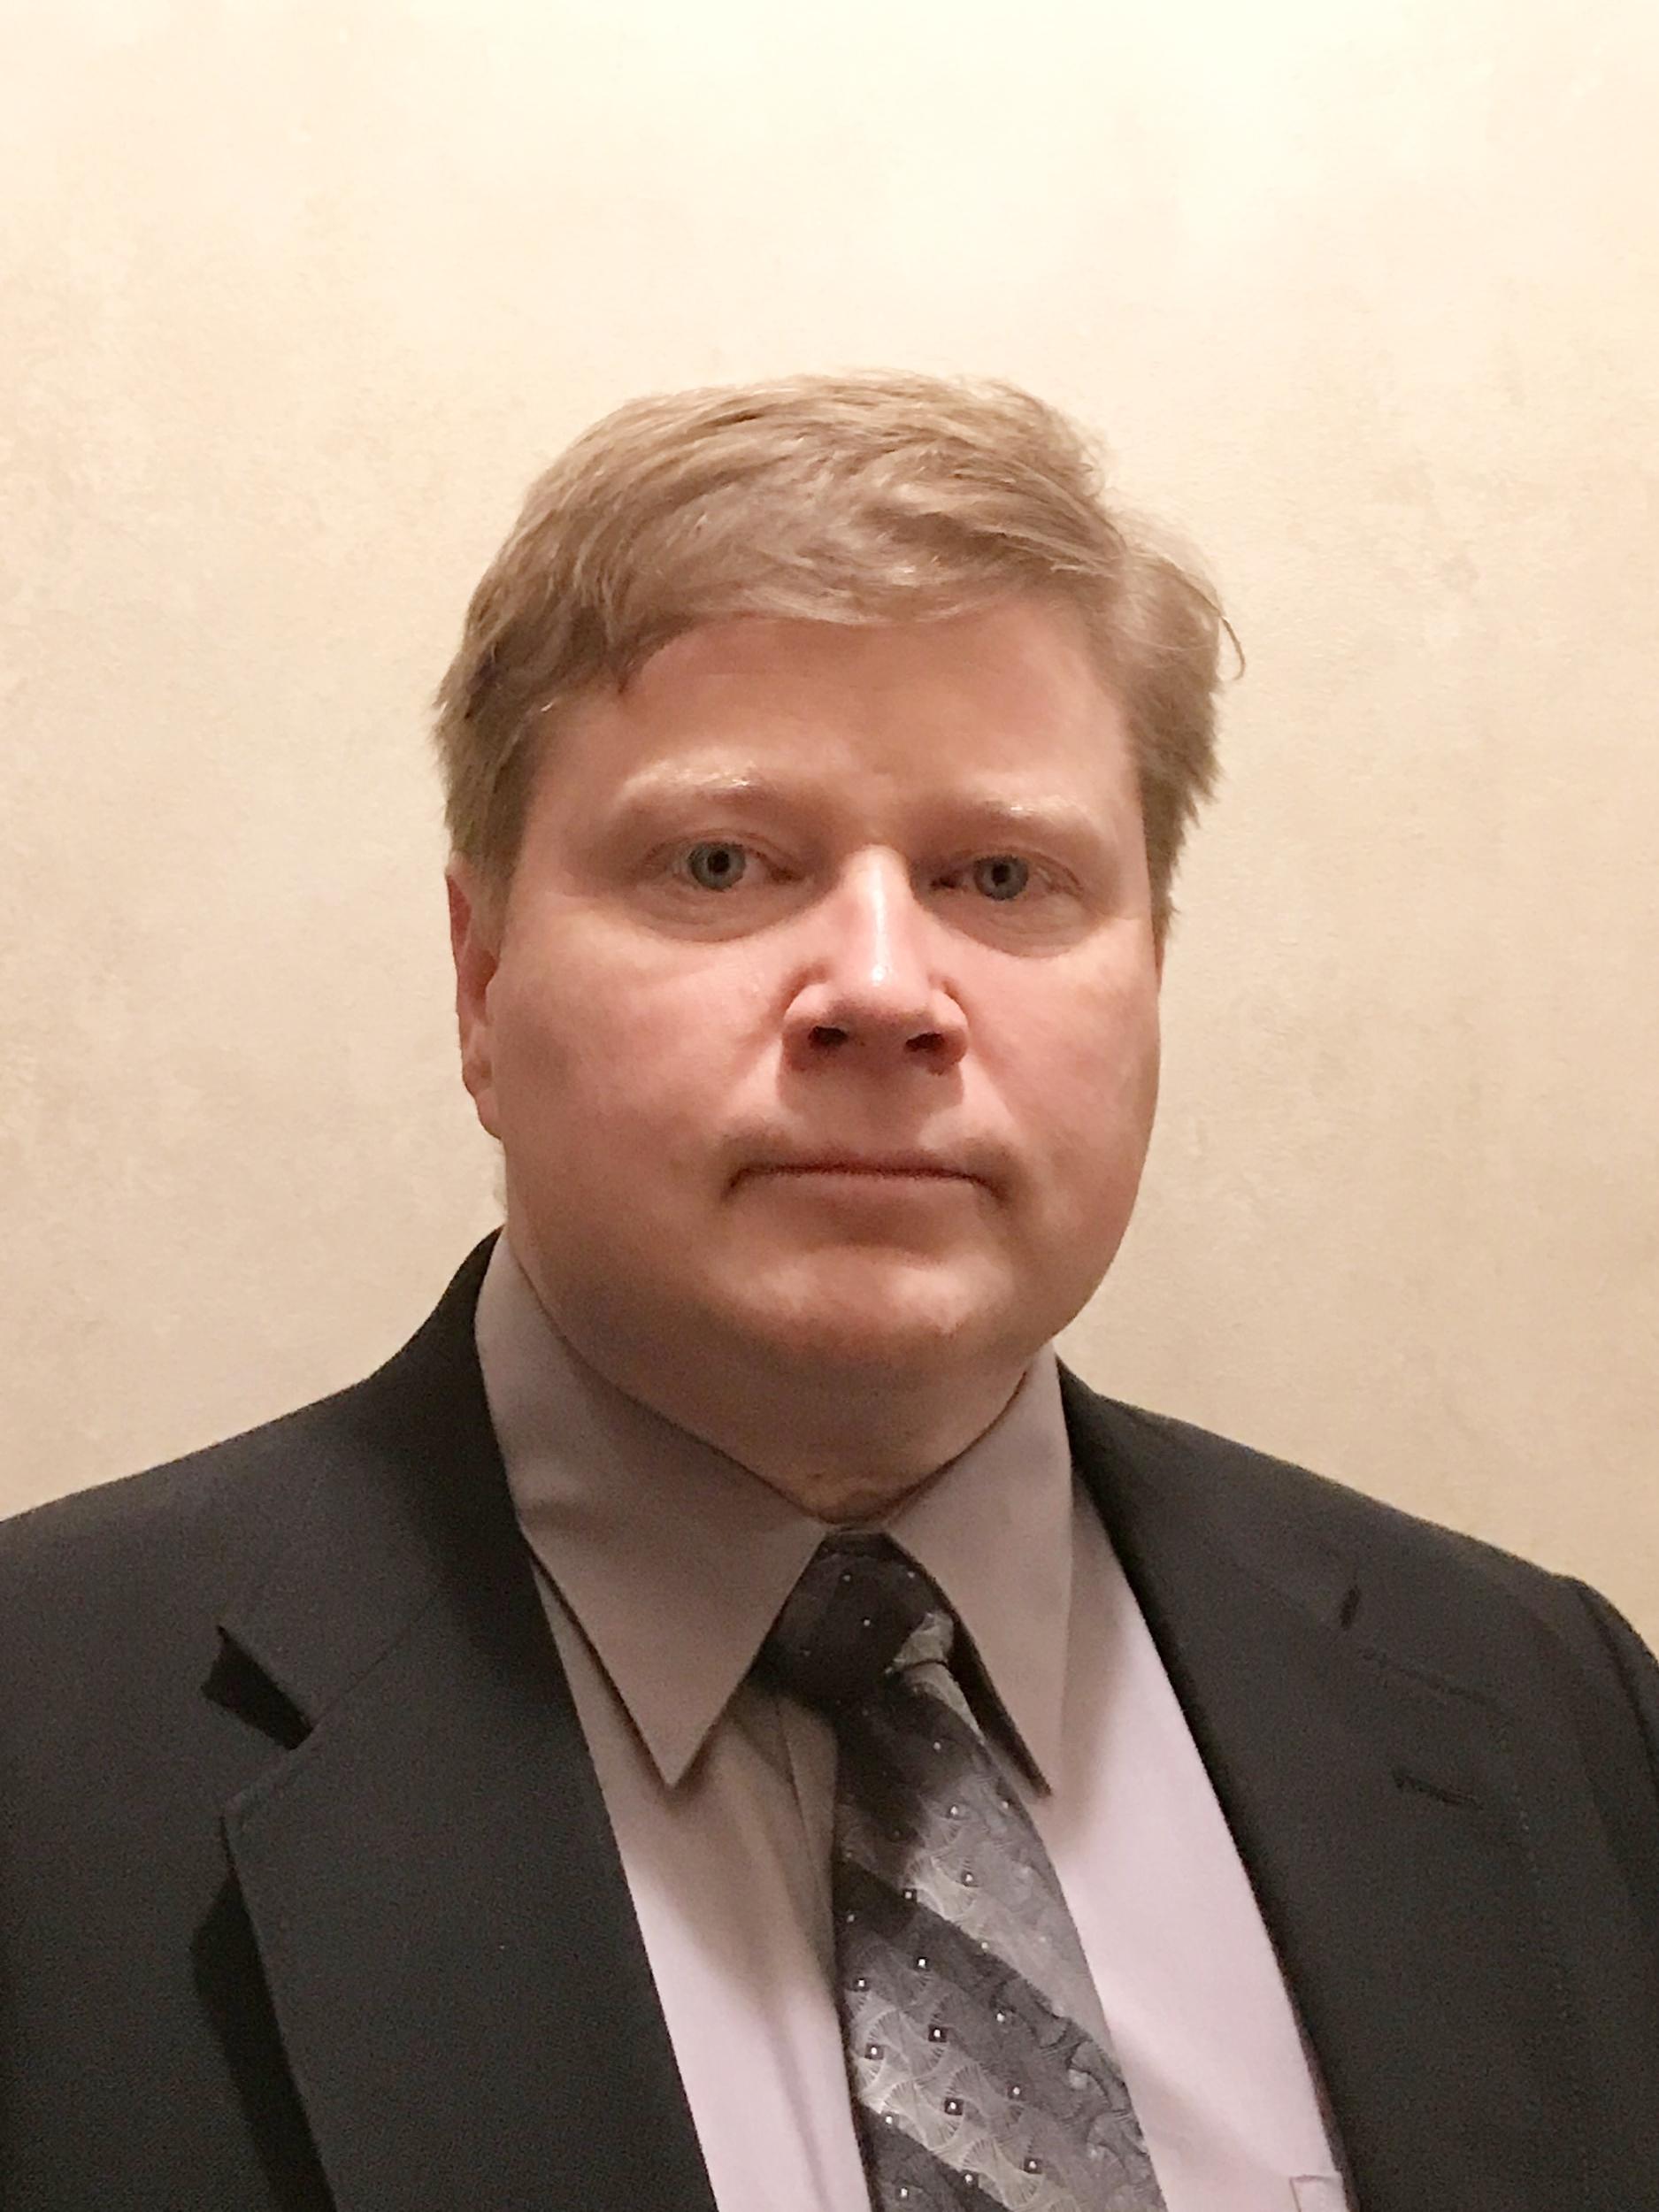 Pastor Daniel Iwinski - dciwinski@hotmail.com(309) 428-9680